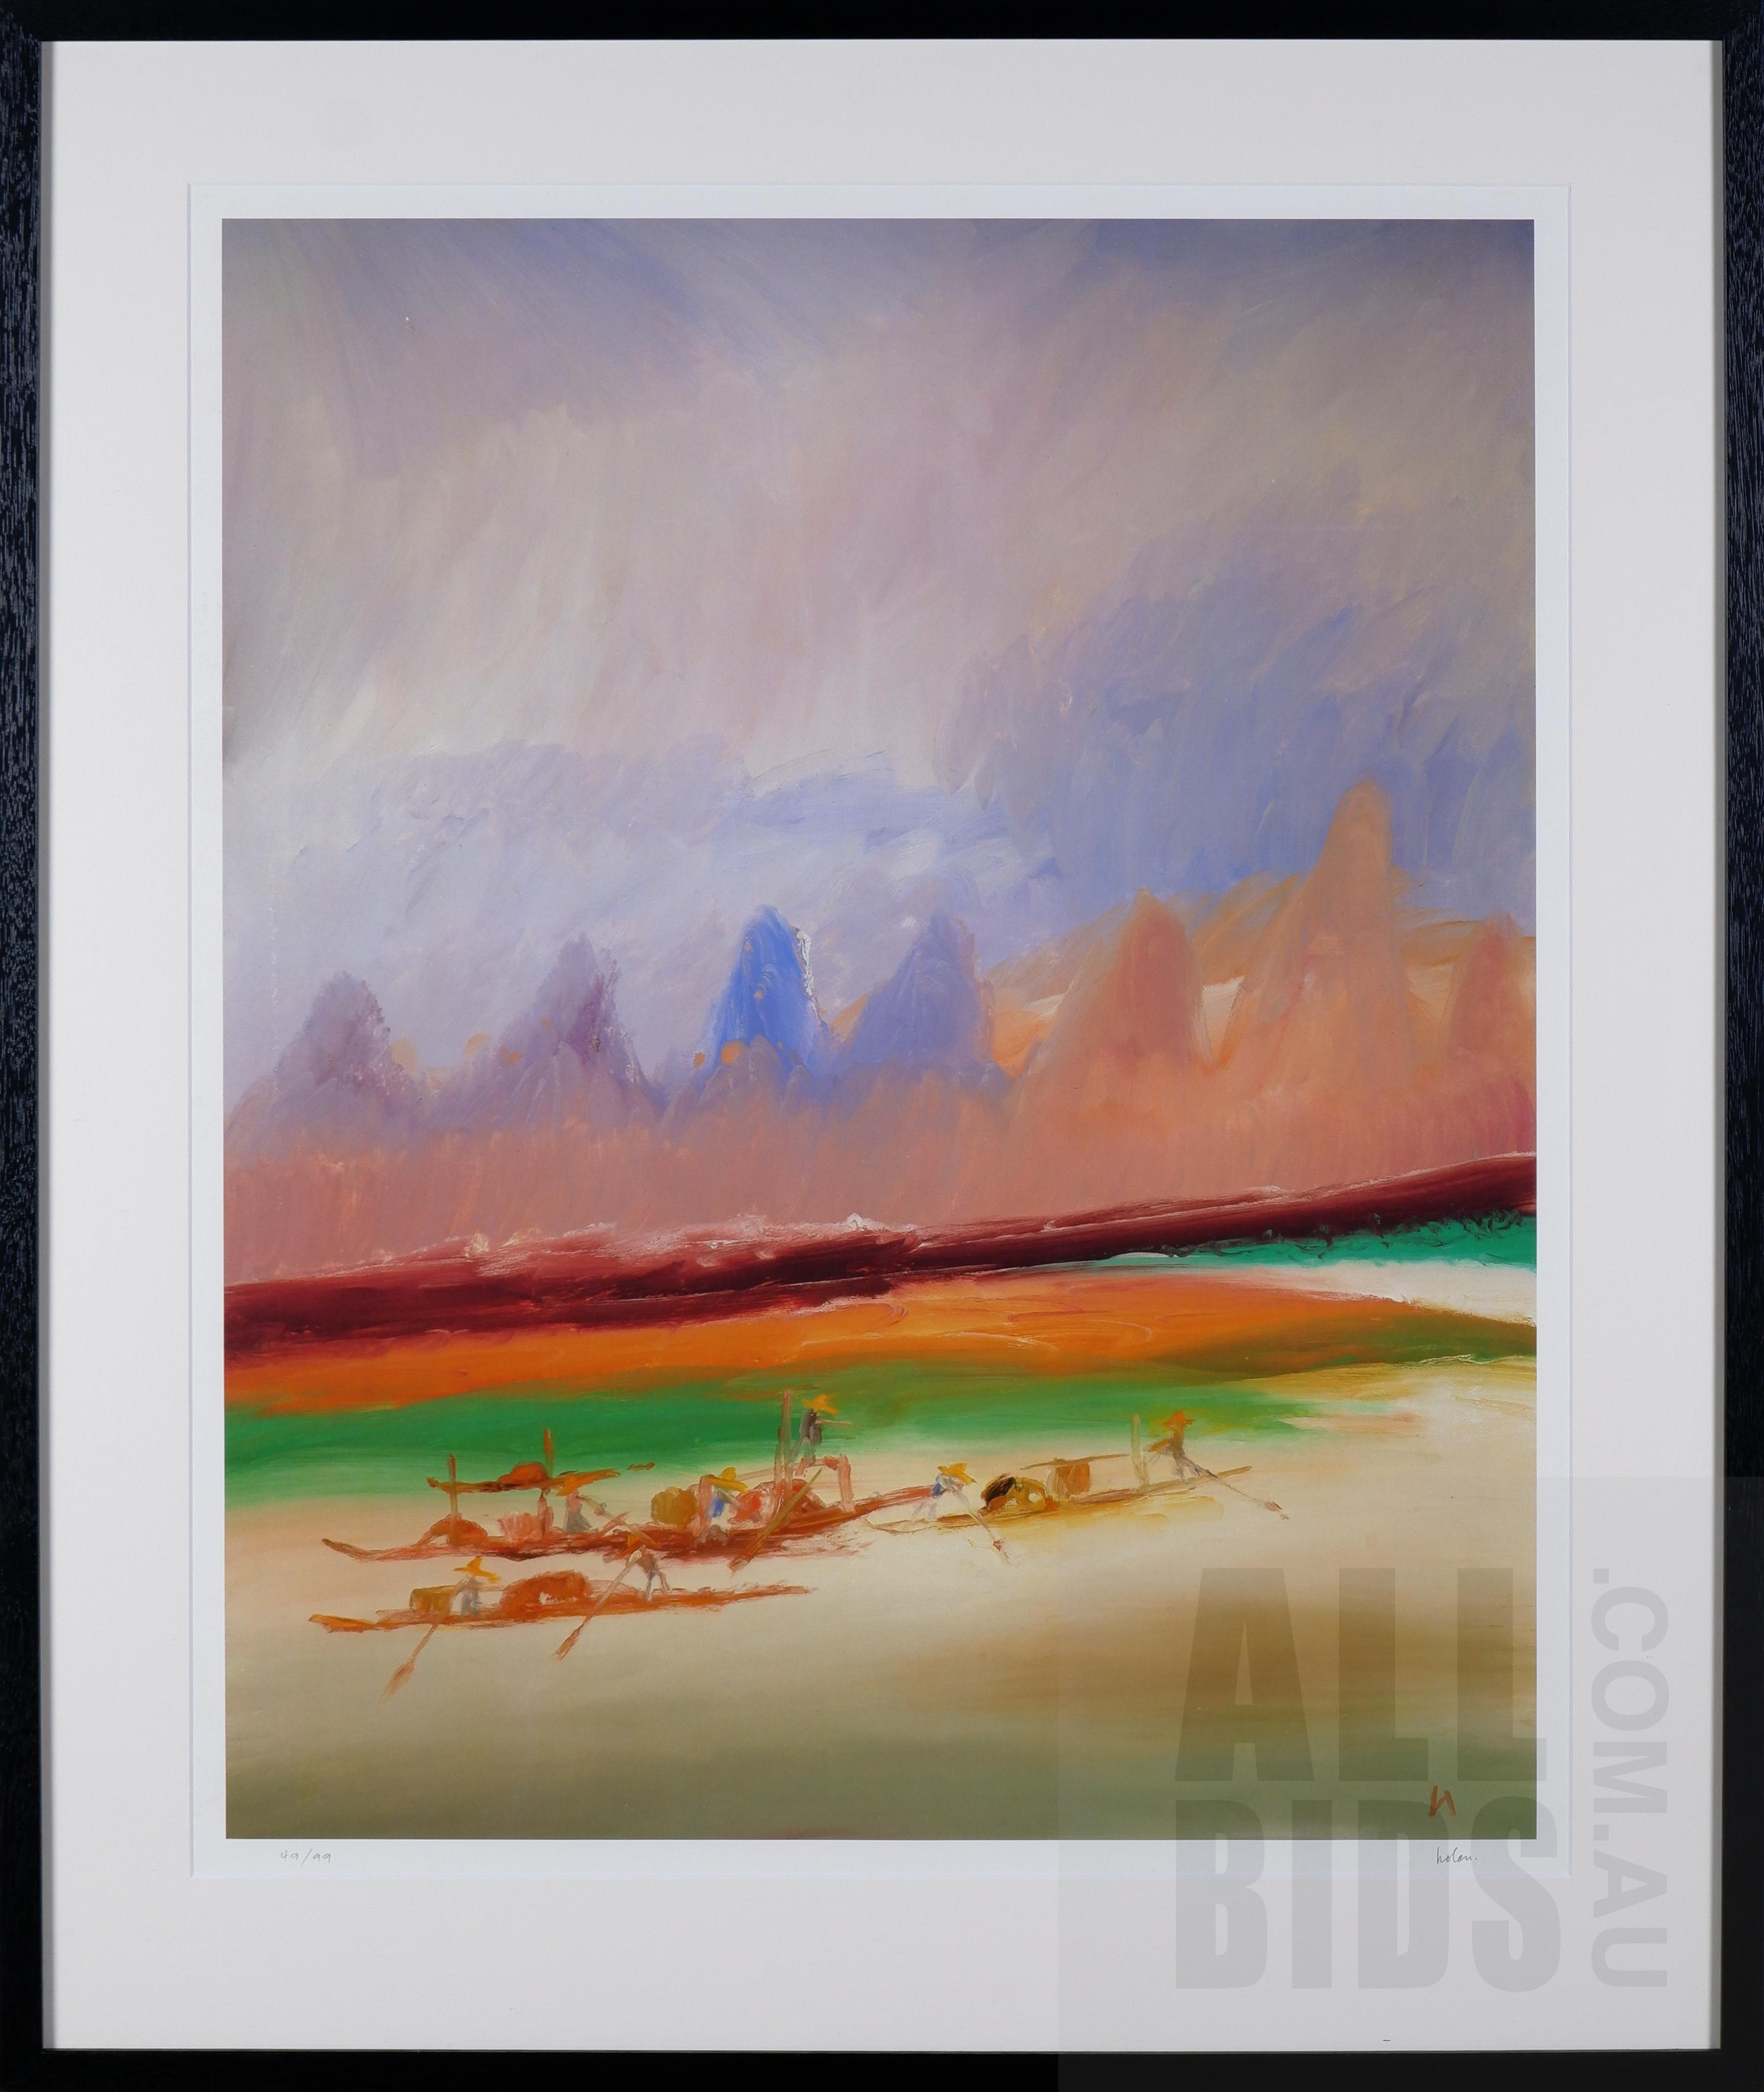 'Sidney Nolan (1917-1992), River Kwai Series, Photolithograph, 71 x 57 cm (image size)'